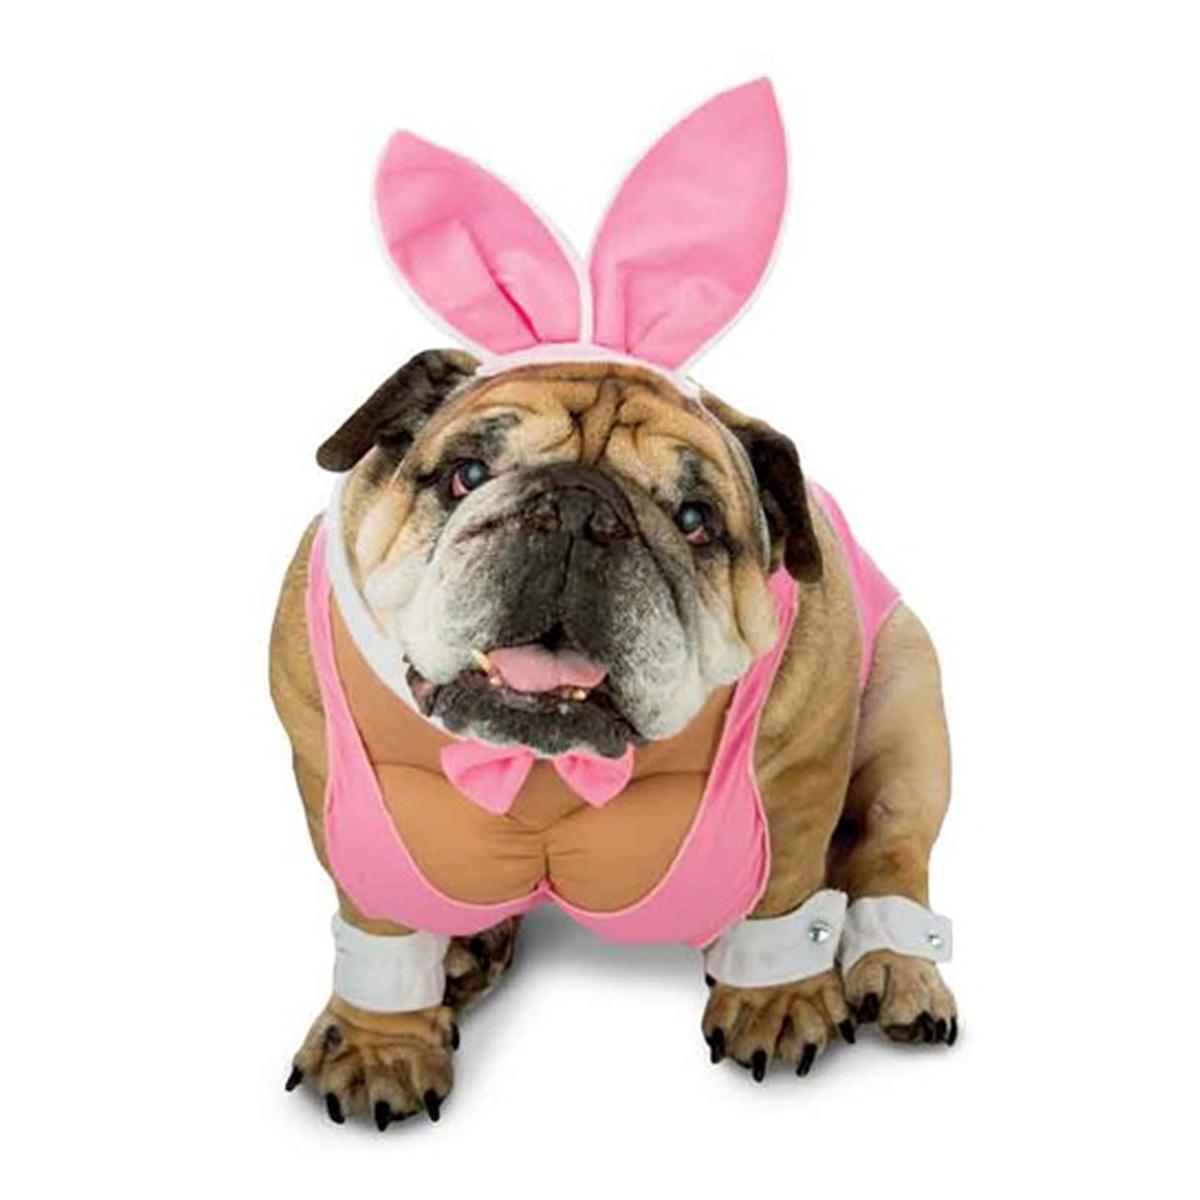 zelda-hunny-bunny-halloween-dog-costume-1.jpg